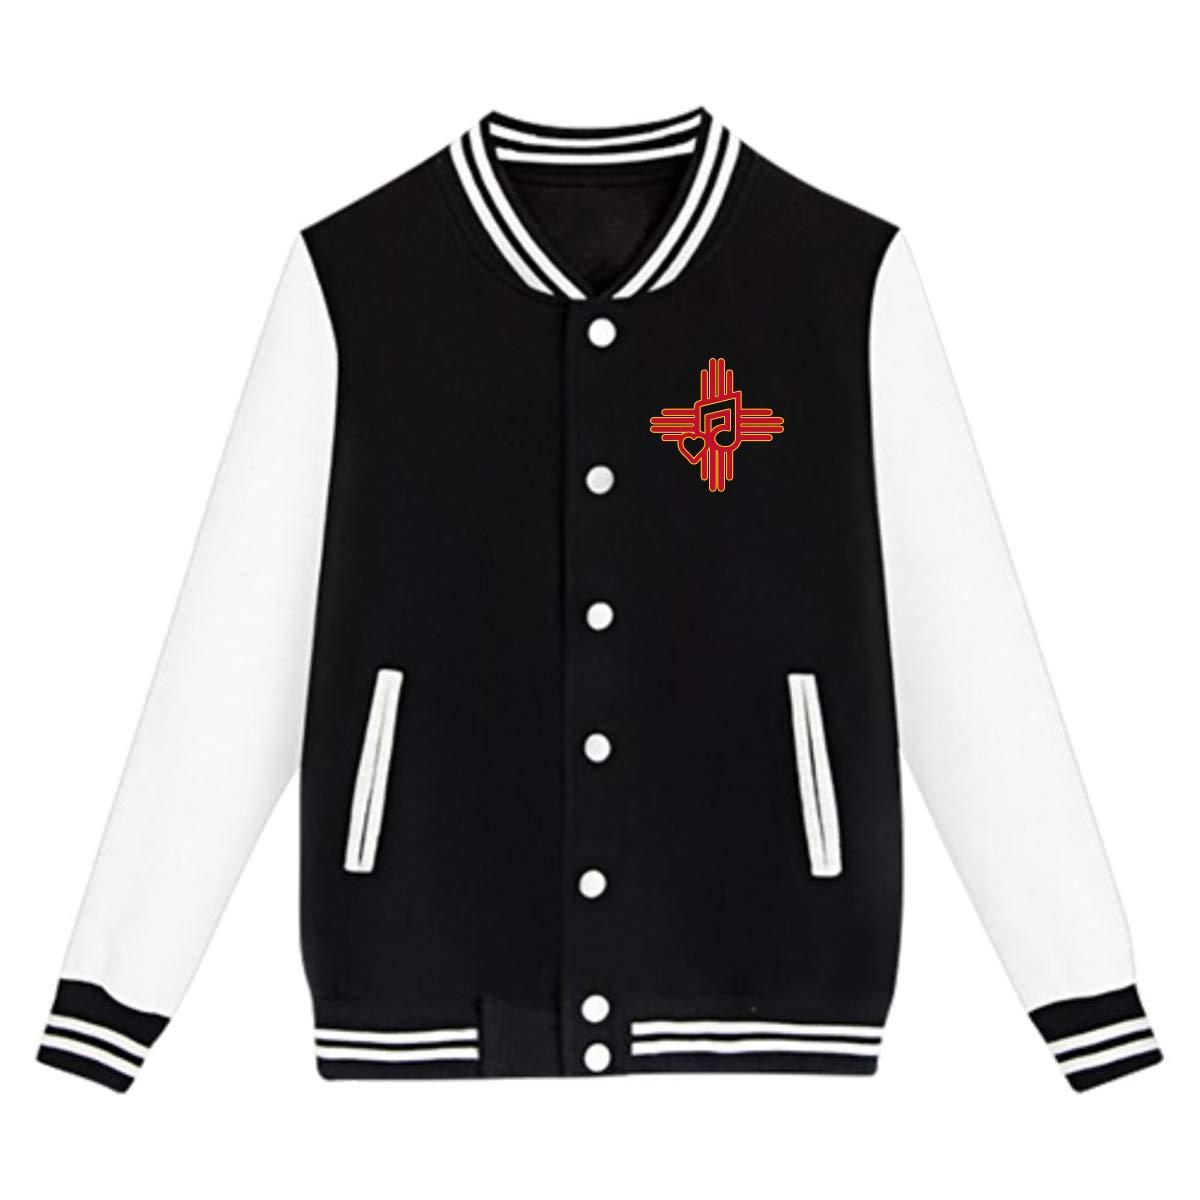 Tina TN New Mexico Spanish Music Teens Boys Girl Varsity Baseball Jacket Long Sleeve Sport Baseball Uniform Jacket Coat Sweater Black